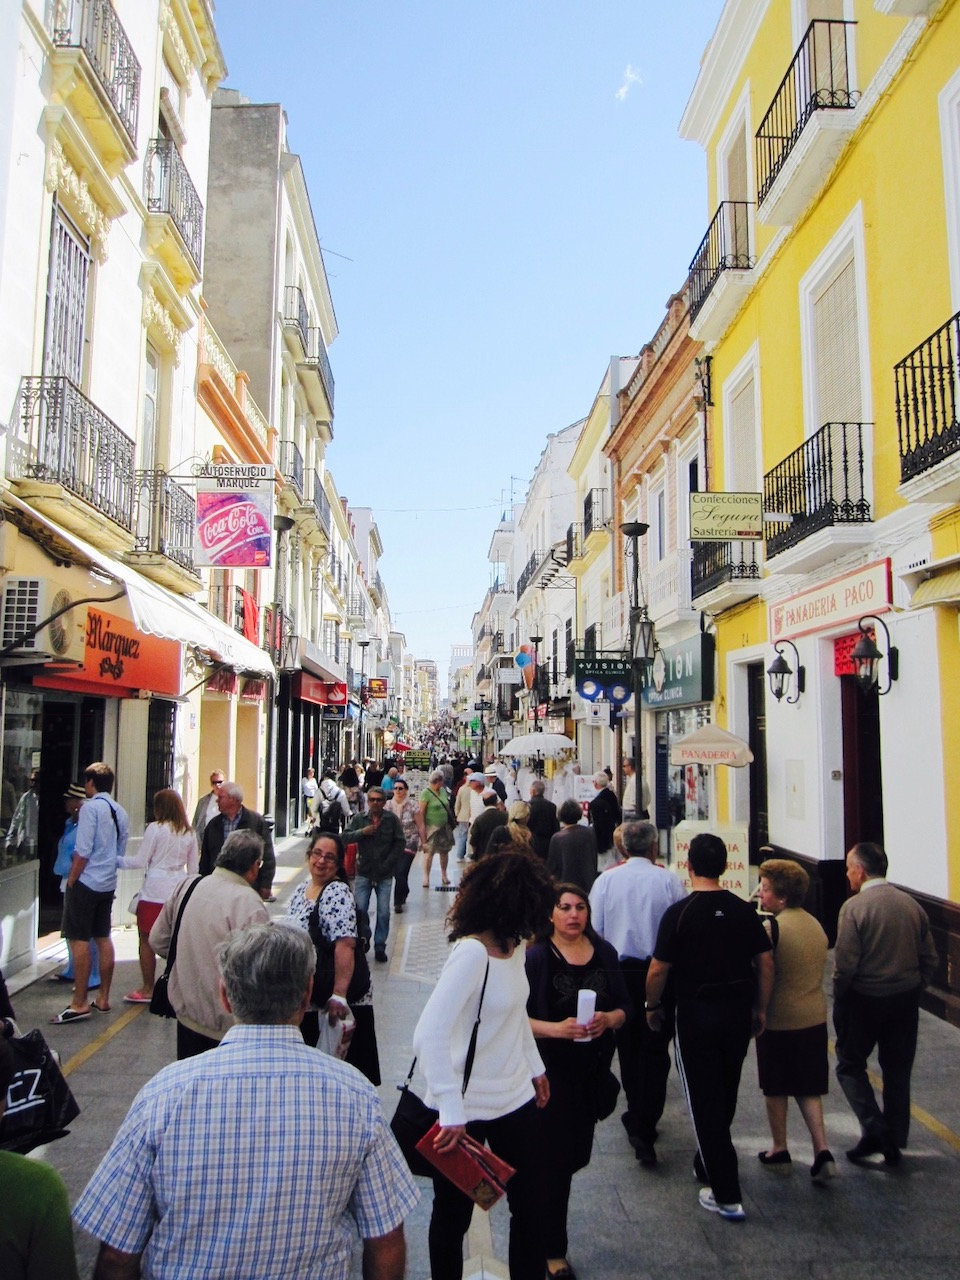 Blick in die Fußgängerzone in Ronda, Andalusien